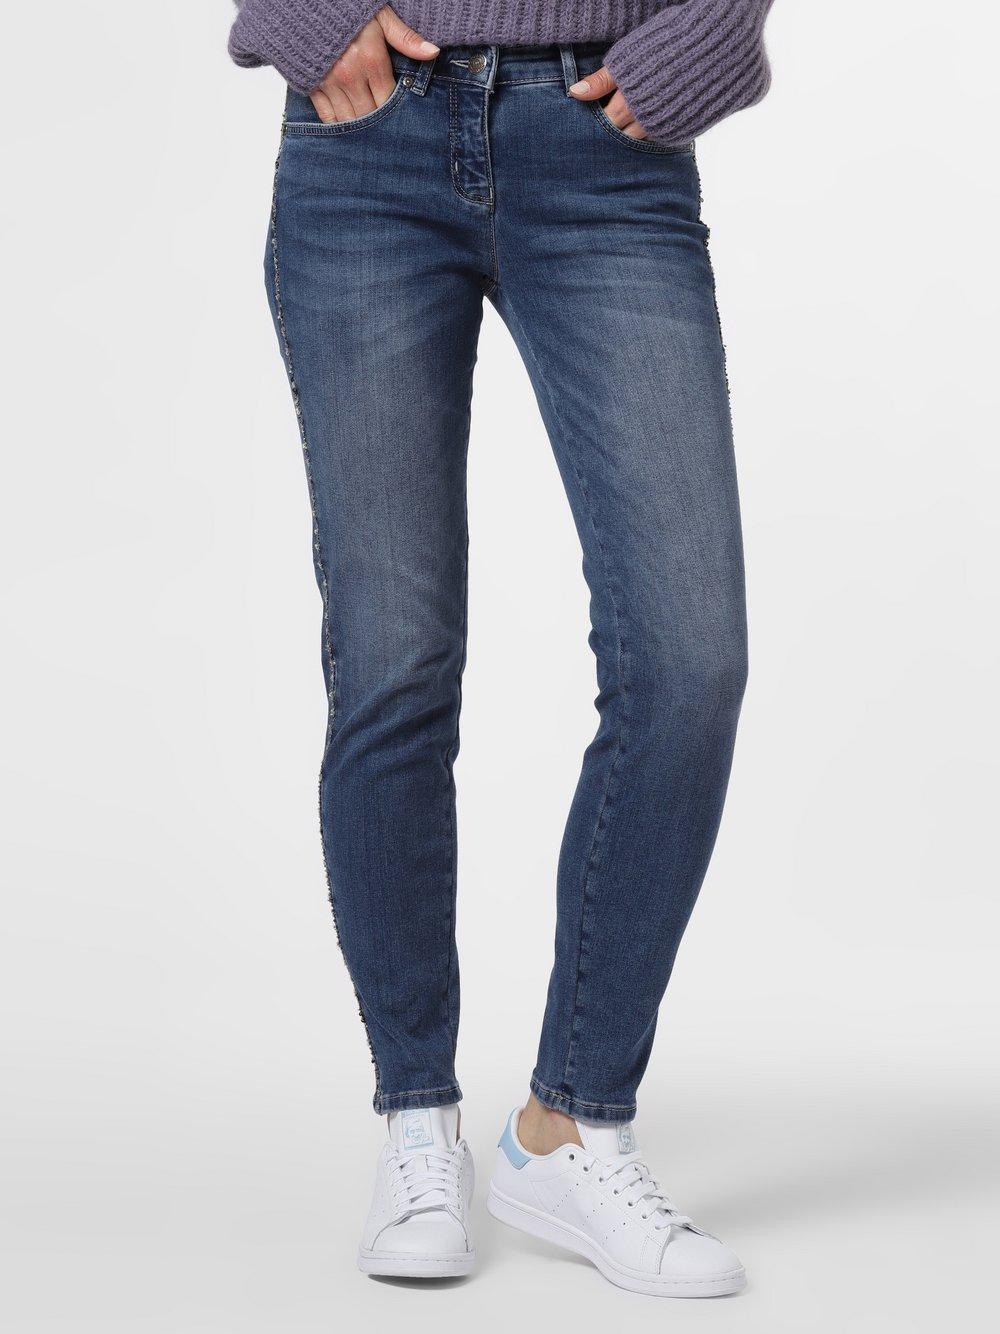 TONI – Jeansy damskie – Perfect Shape Skinny, niebieski Van Graaf 483316-0001-00440